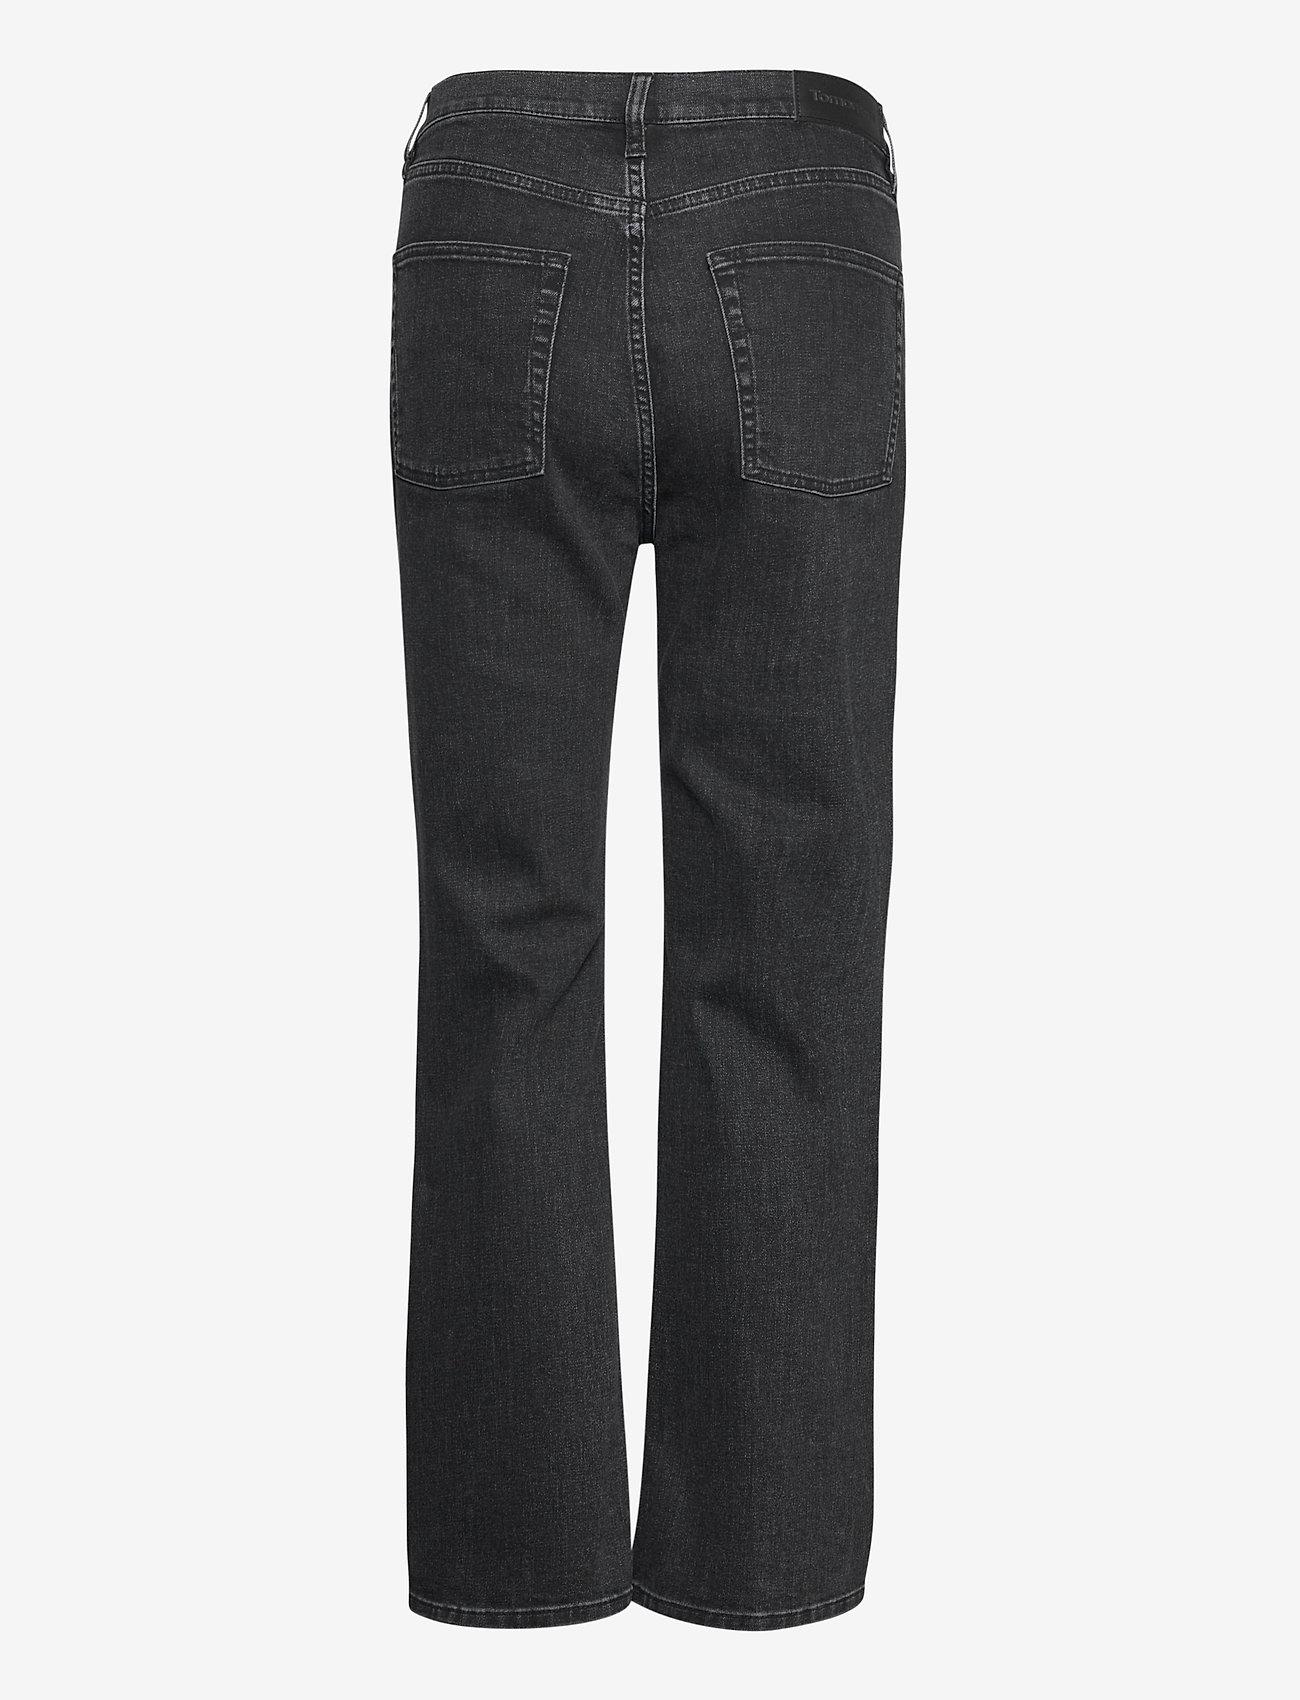 Tomorrow - Marston jeans original black - straight jeans - black - 1